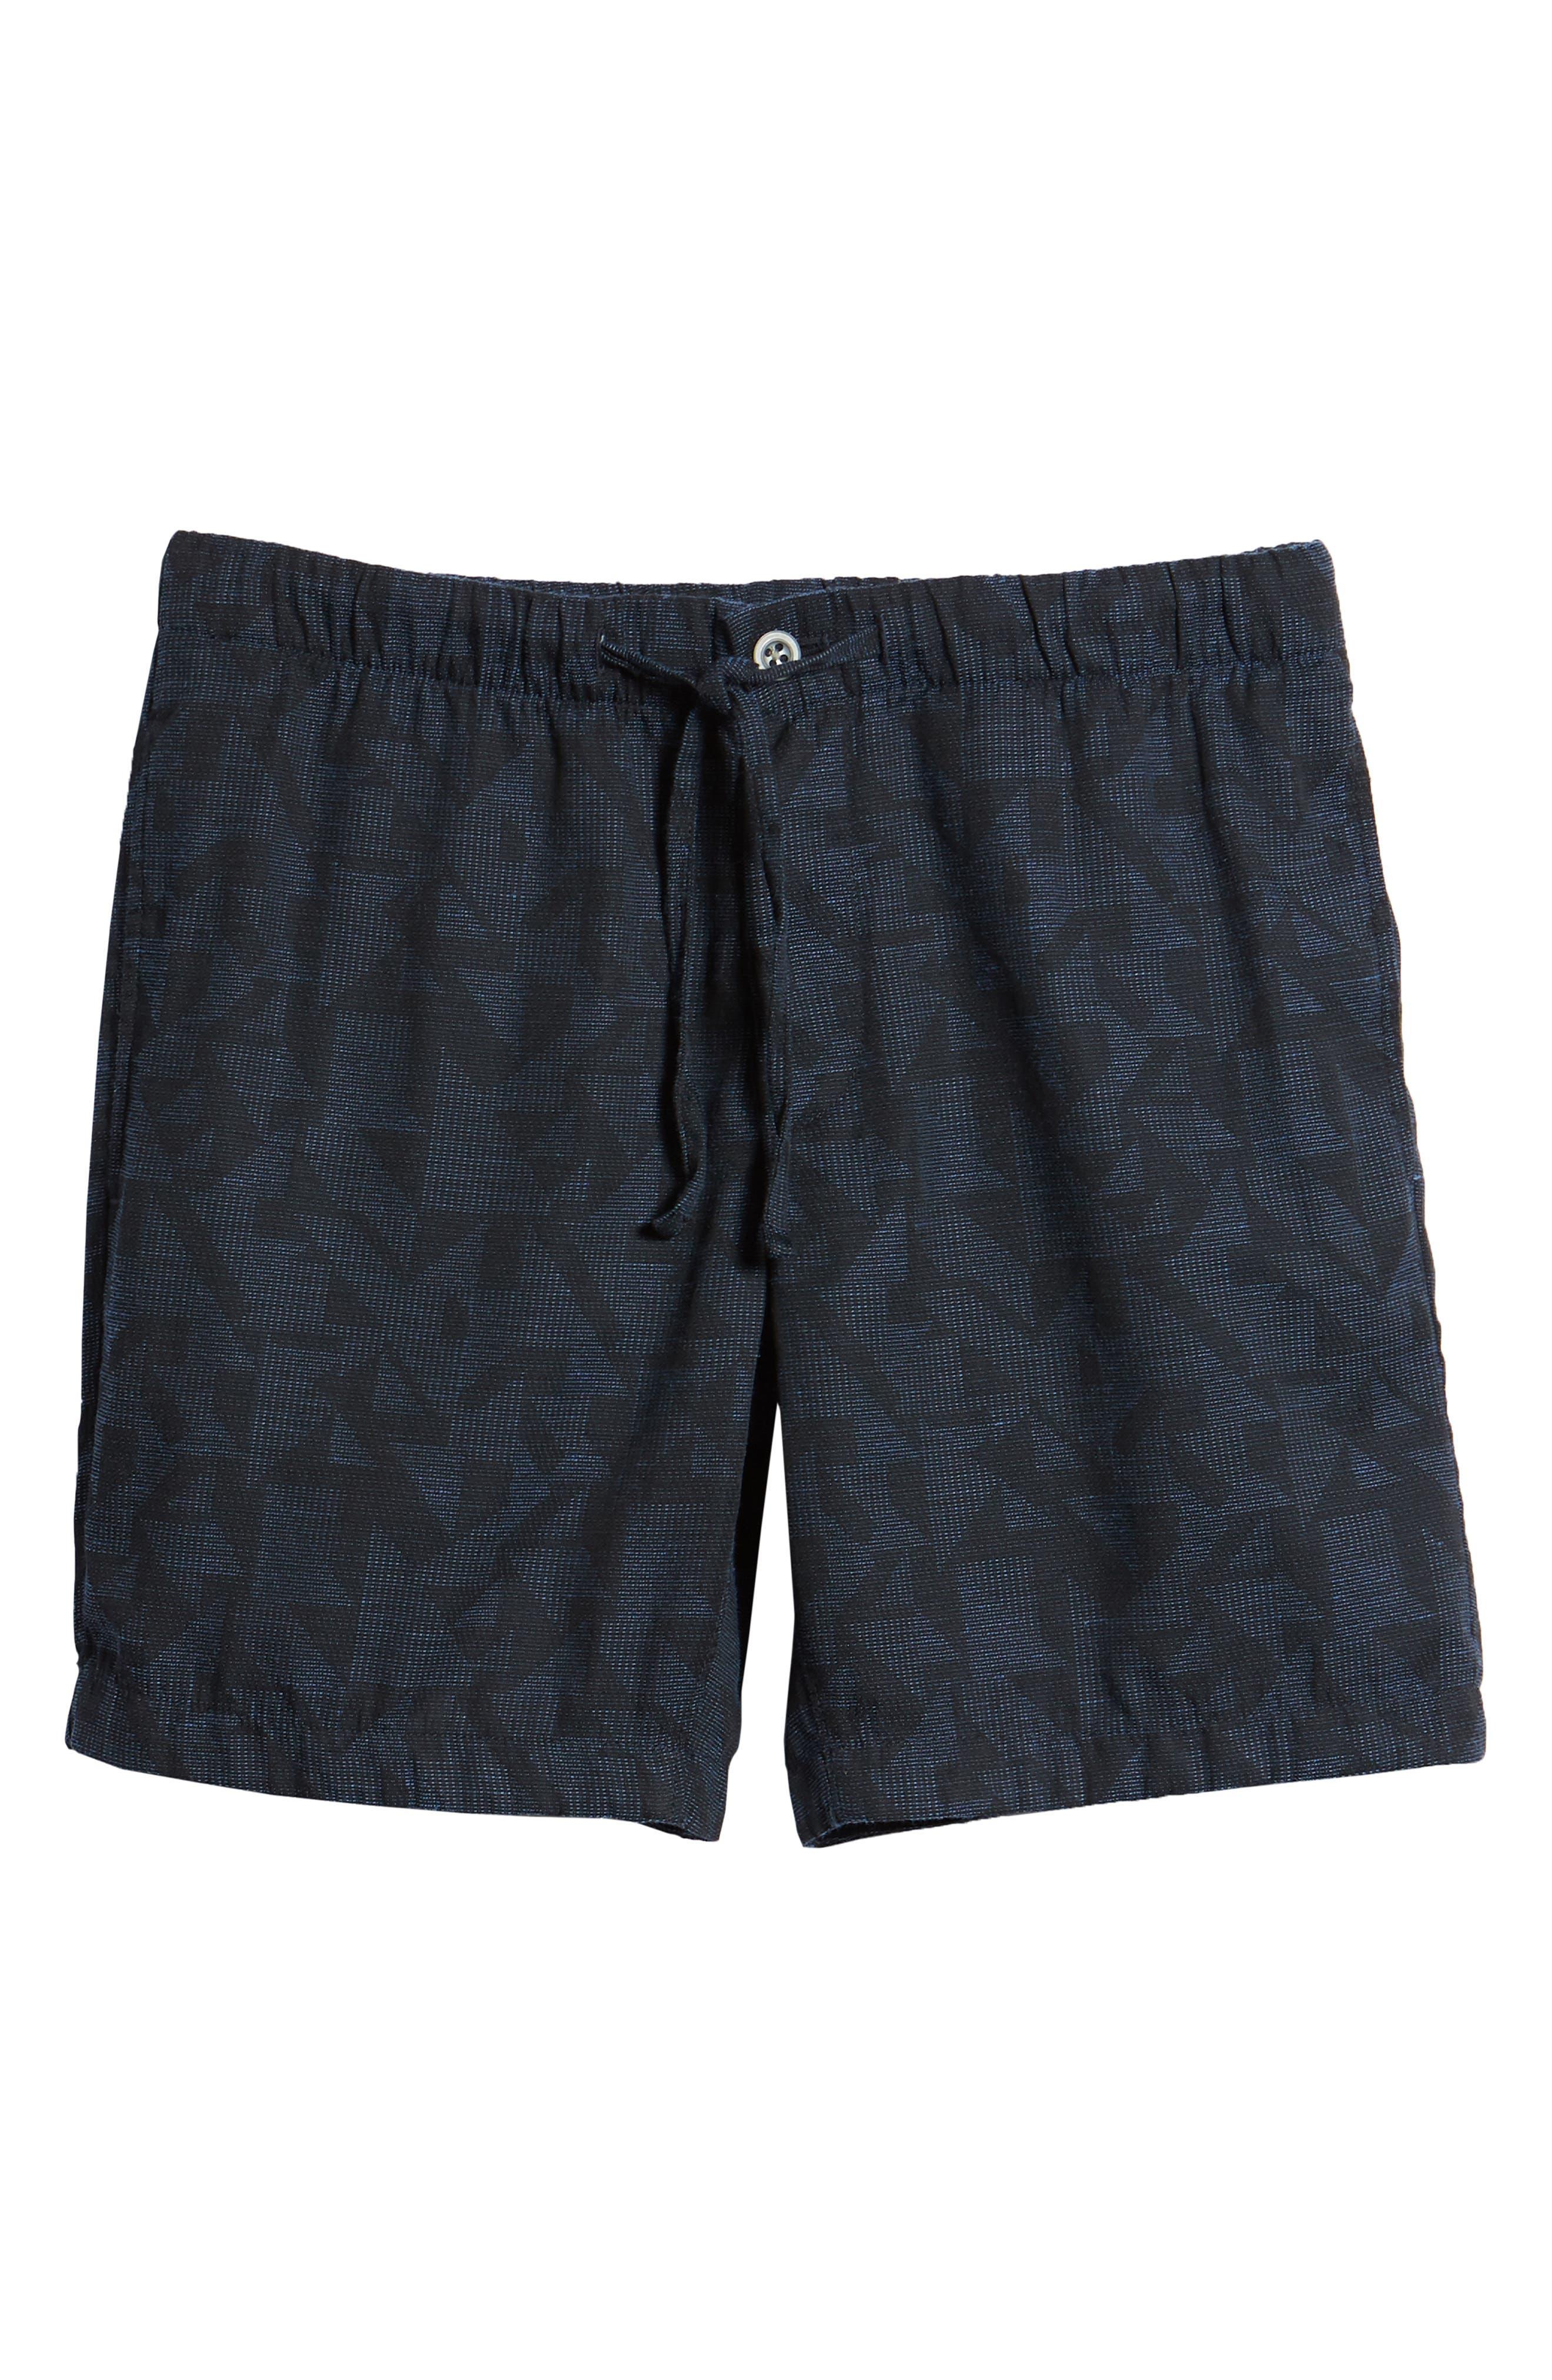 Print Beach Shorts,                             Alternate thumbnail 6, color,                             Navy Triangle Jacquard